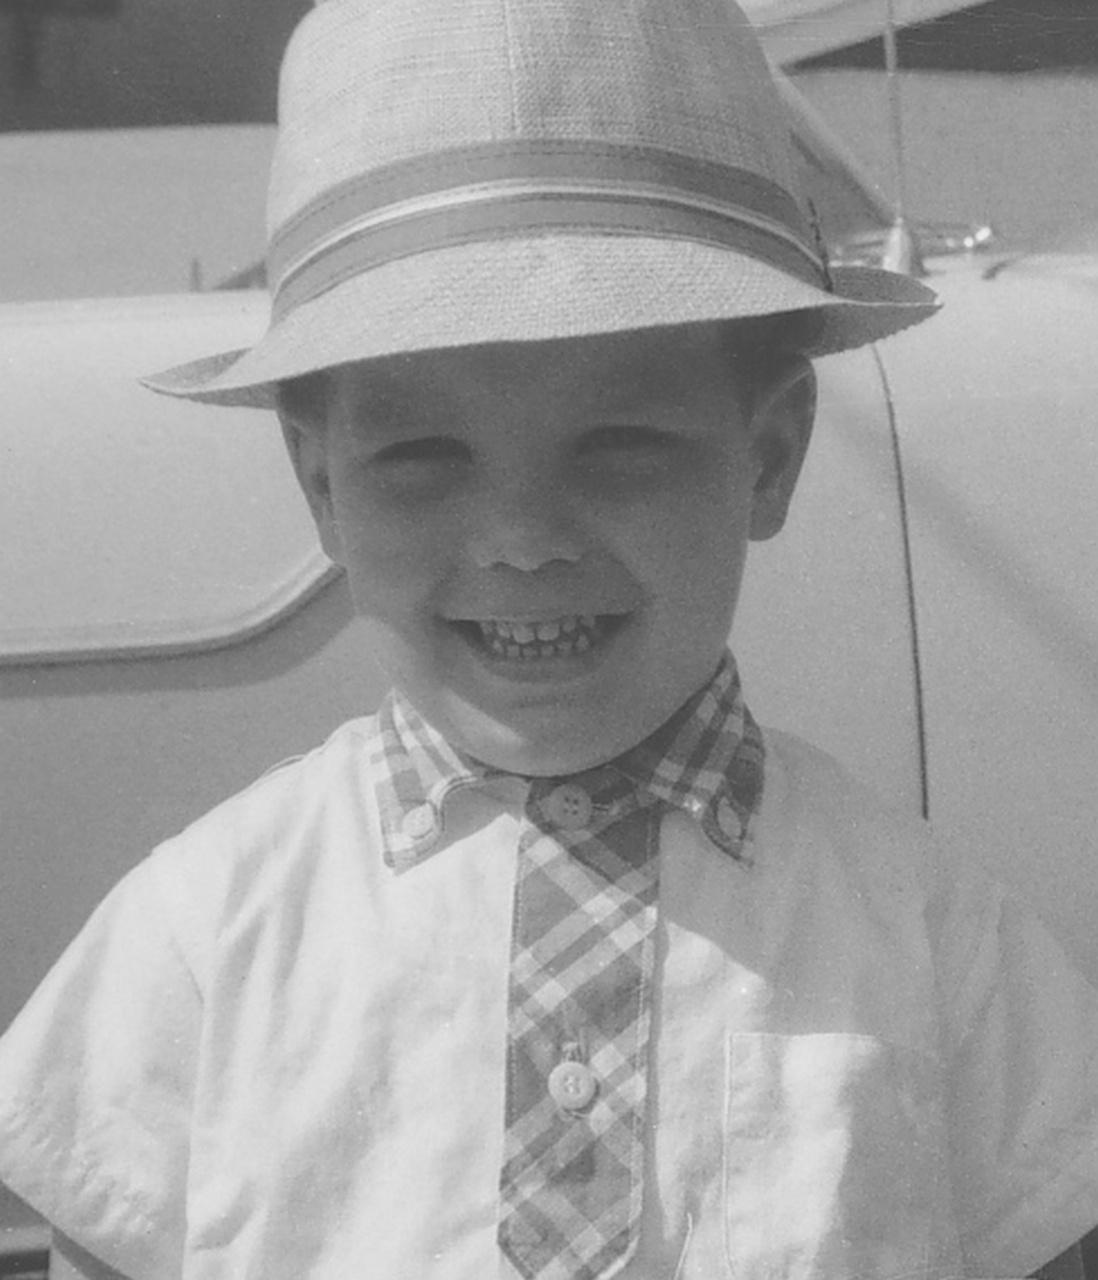 1960 John - Tucson